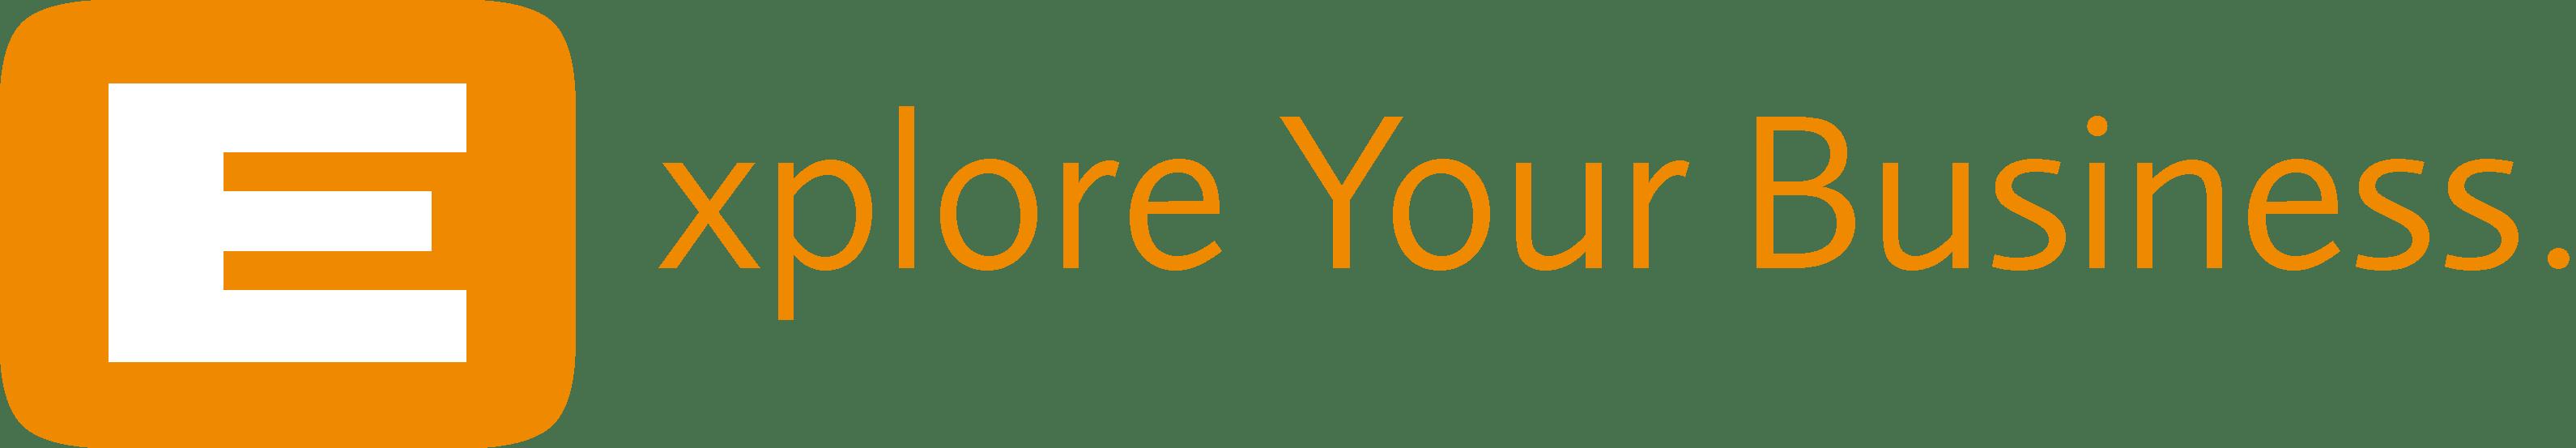 EVACO Claim Explore your Business